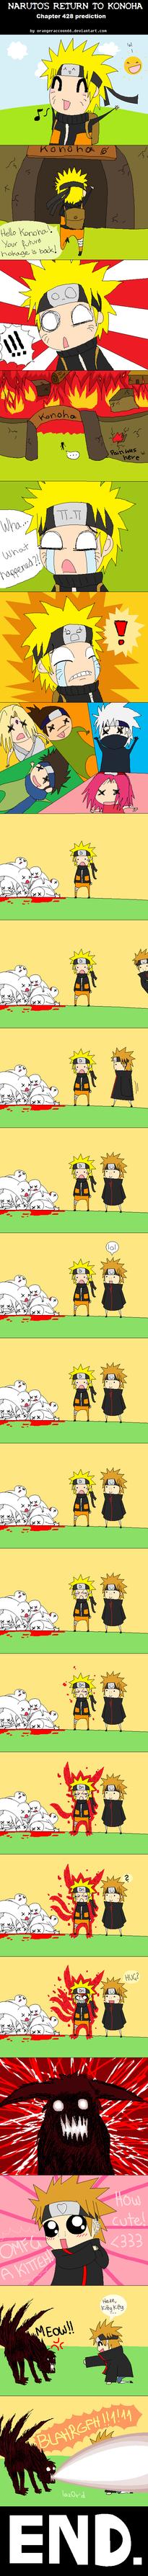 Naruto's Return to Konoha by FancyPancakes